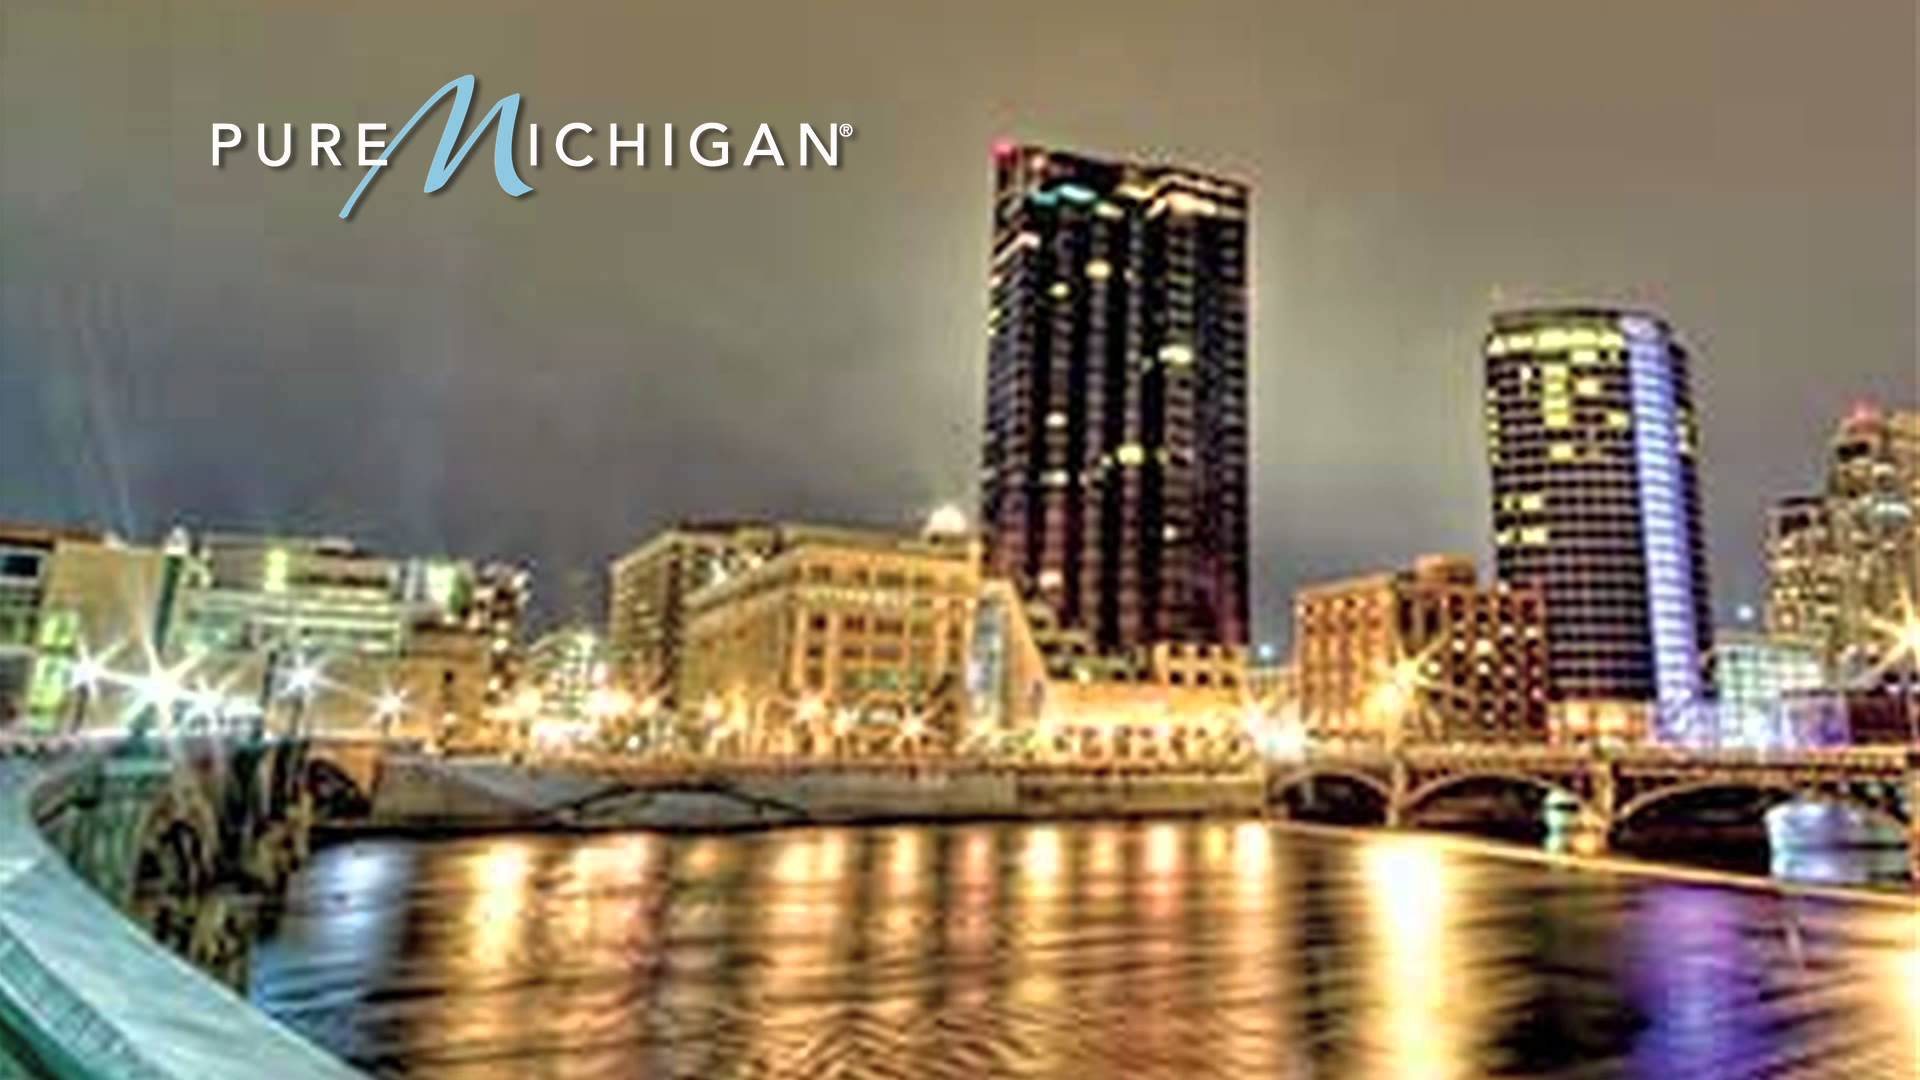 Winter Events in Grand Rapids Pure Michigan 1920x1080